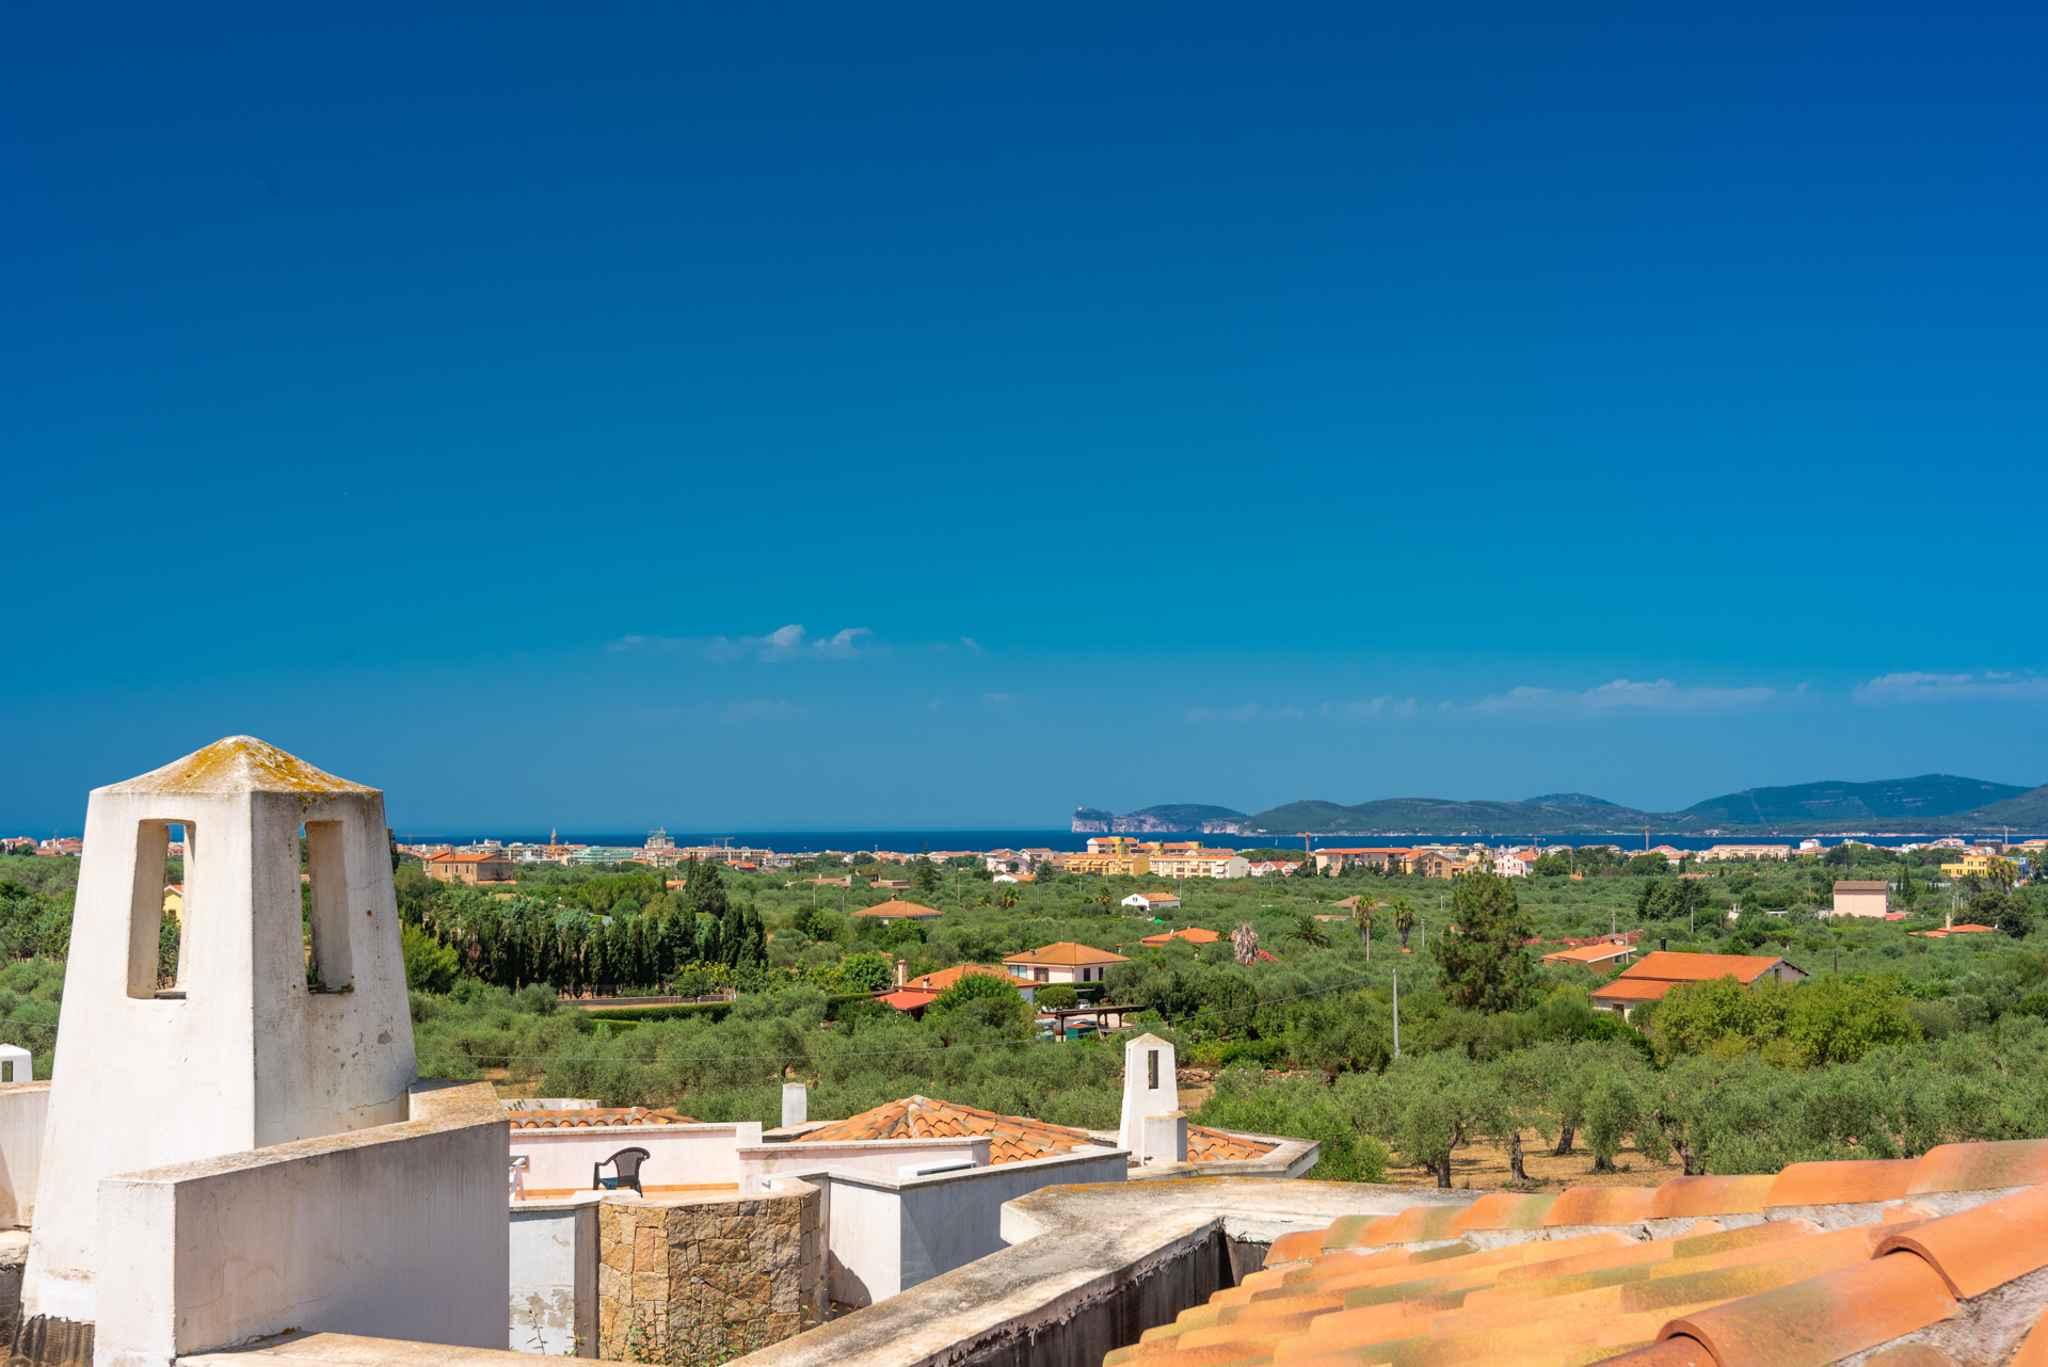 Ferienhaus con giardino (2182422), Alghero, Sassari, Sardinien, Italien, Bild 8